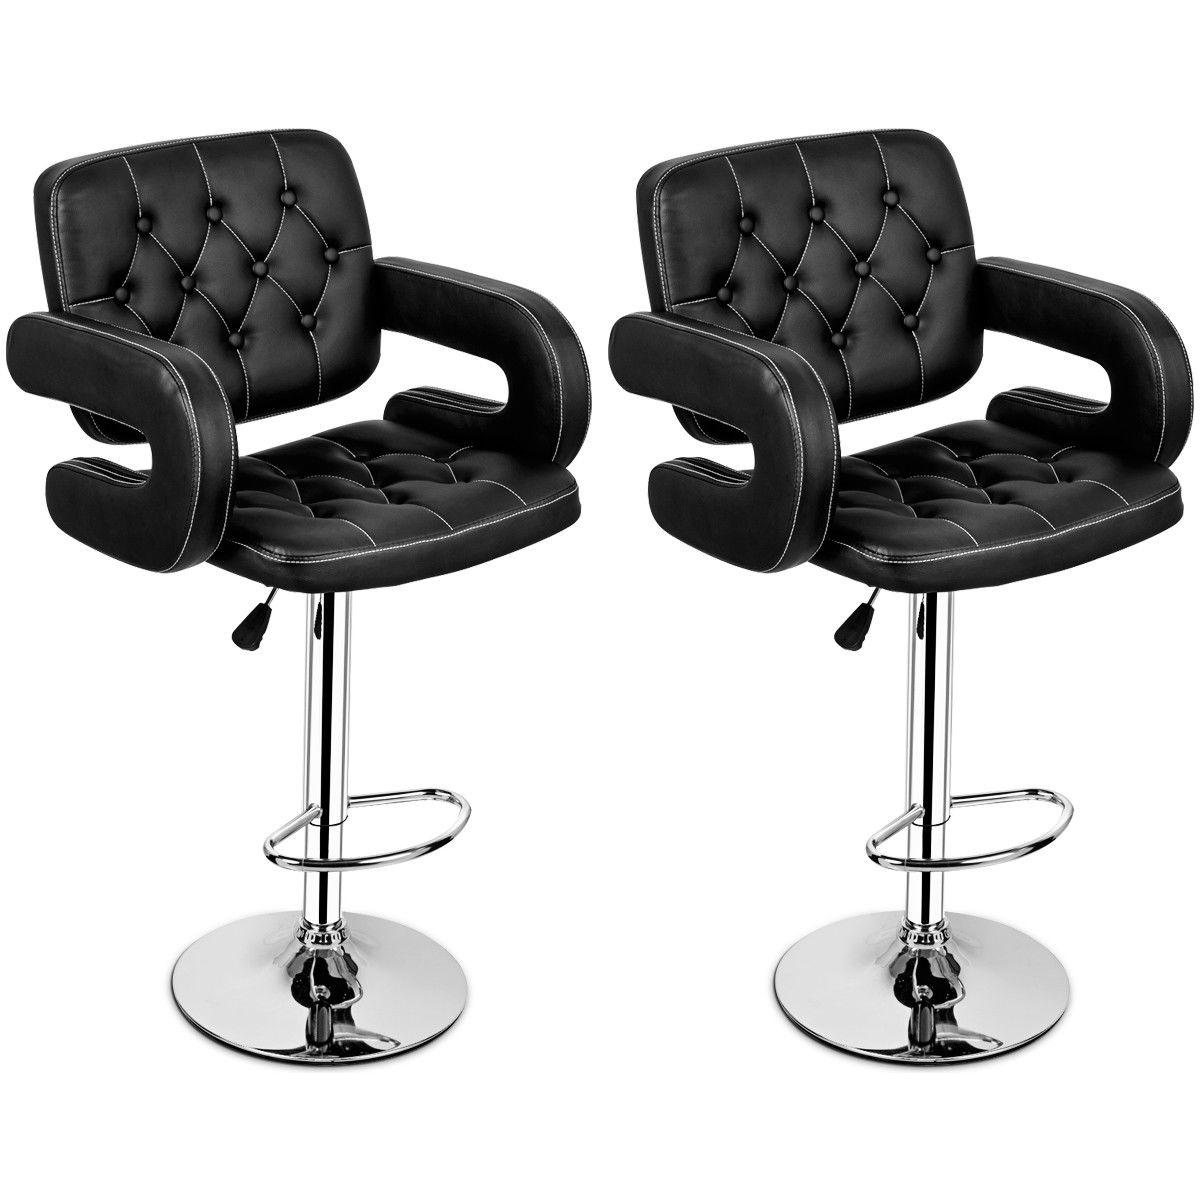 Set of 2 Swivel Bar Stool Leather Modern Adjustable Hydraulic Barstool w//Armrest